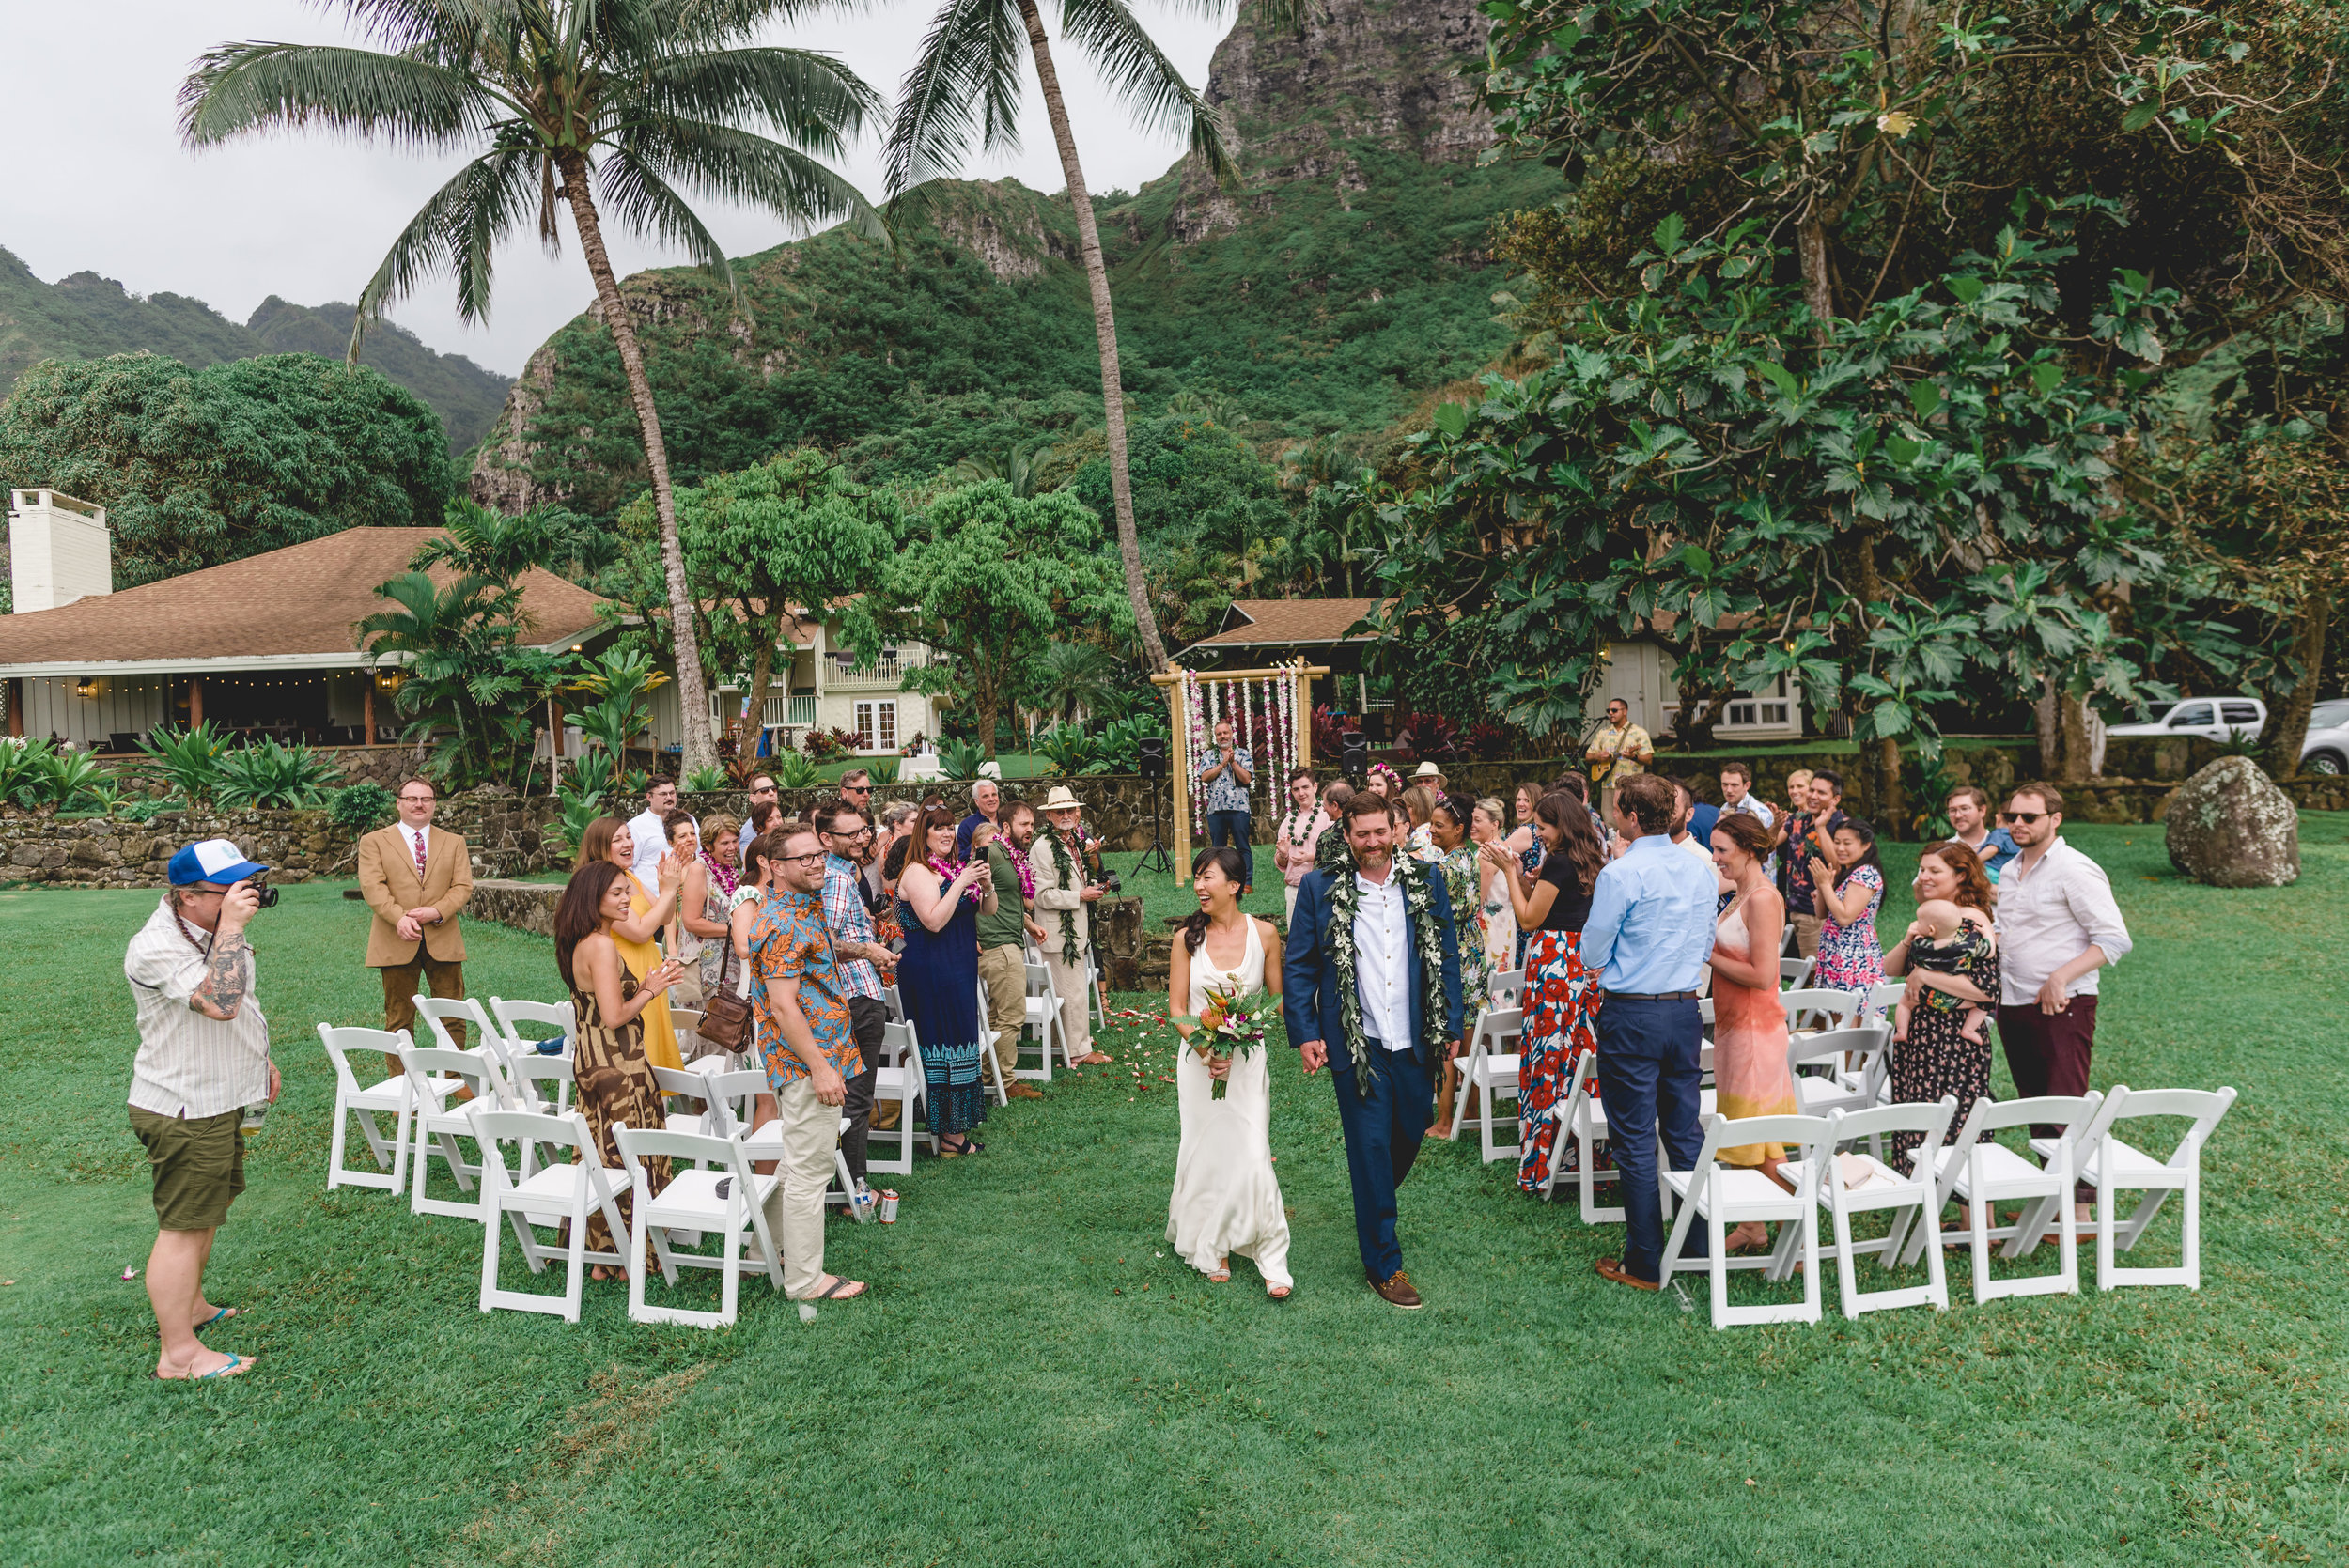 Oahu-Hawaii-Wedding-ceremony-170.jpg